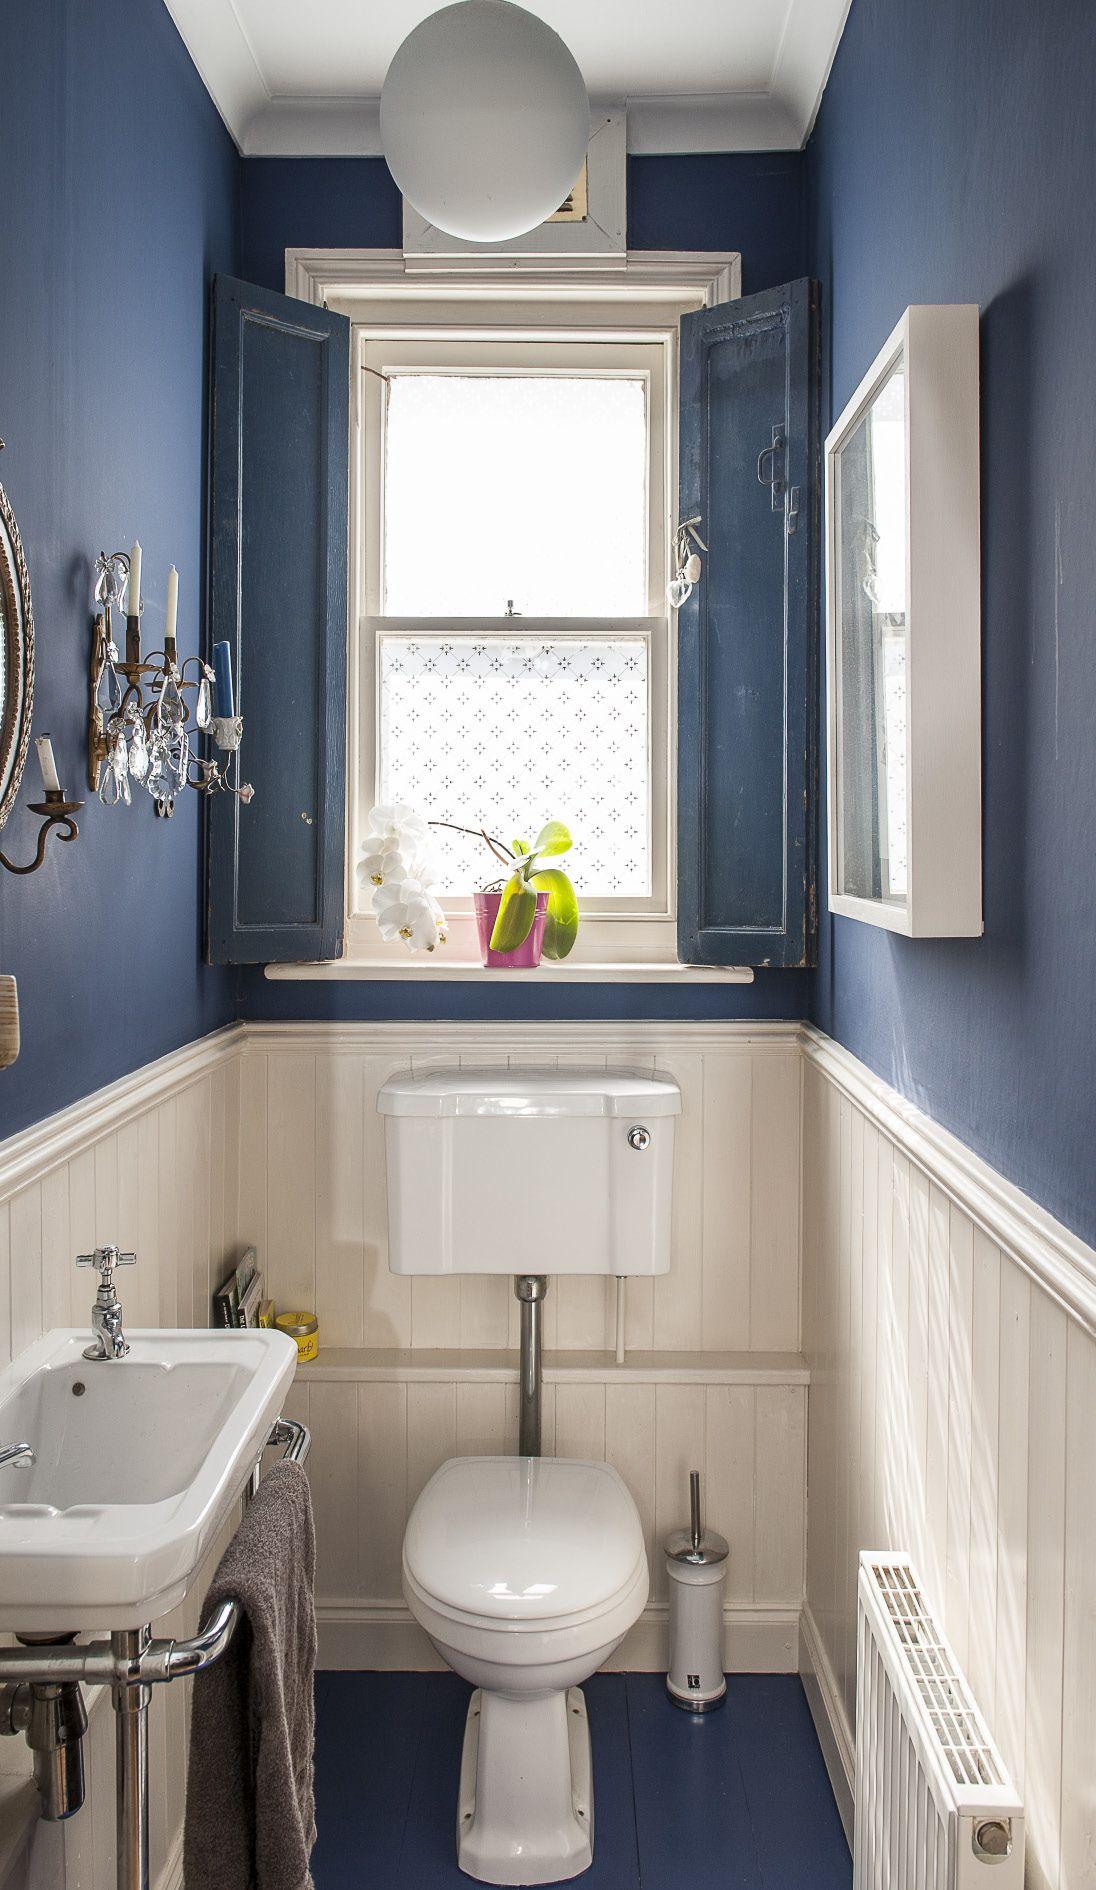 Nautical Blue Paint In The Bathroom Small Toilet Room Bathroom Remodel Cost Modern Bathroom